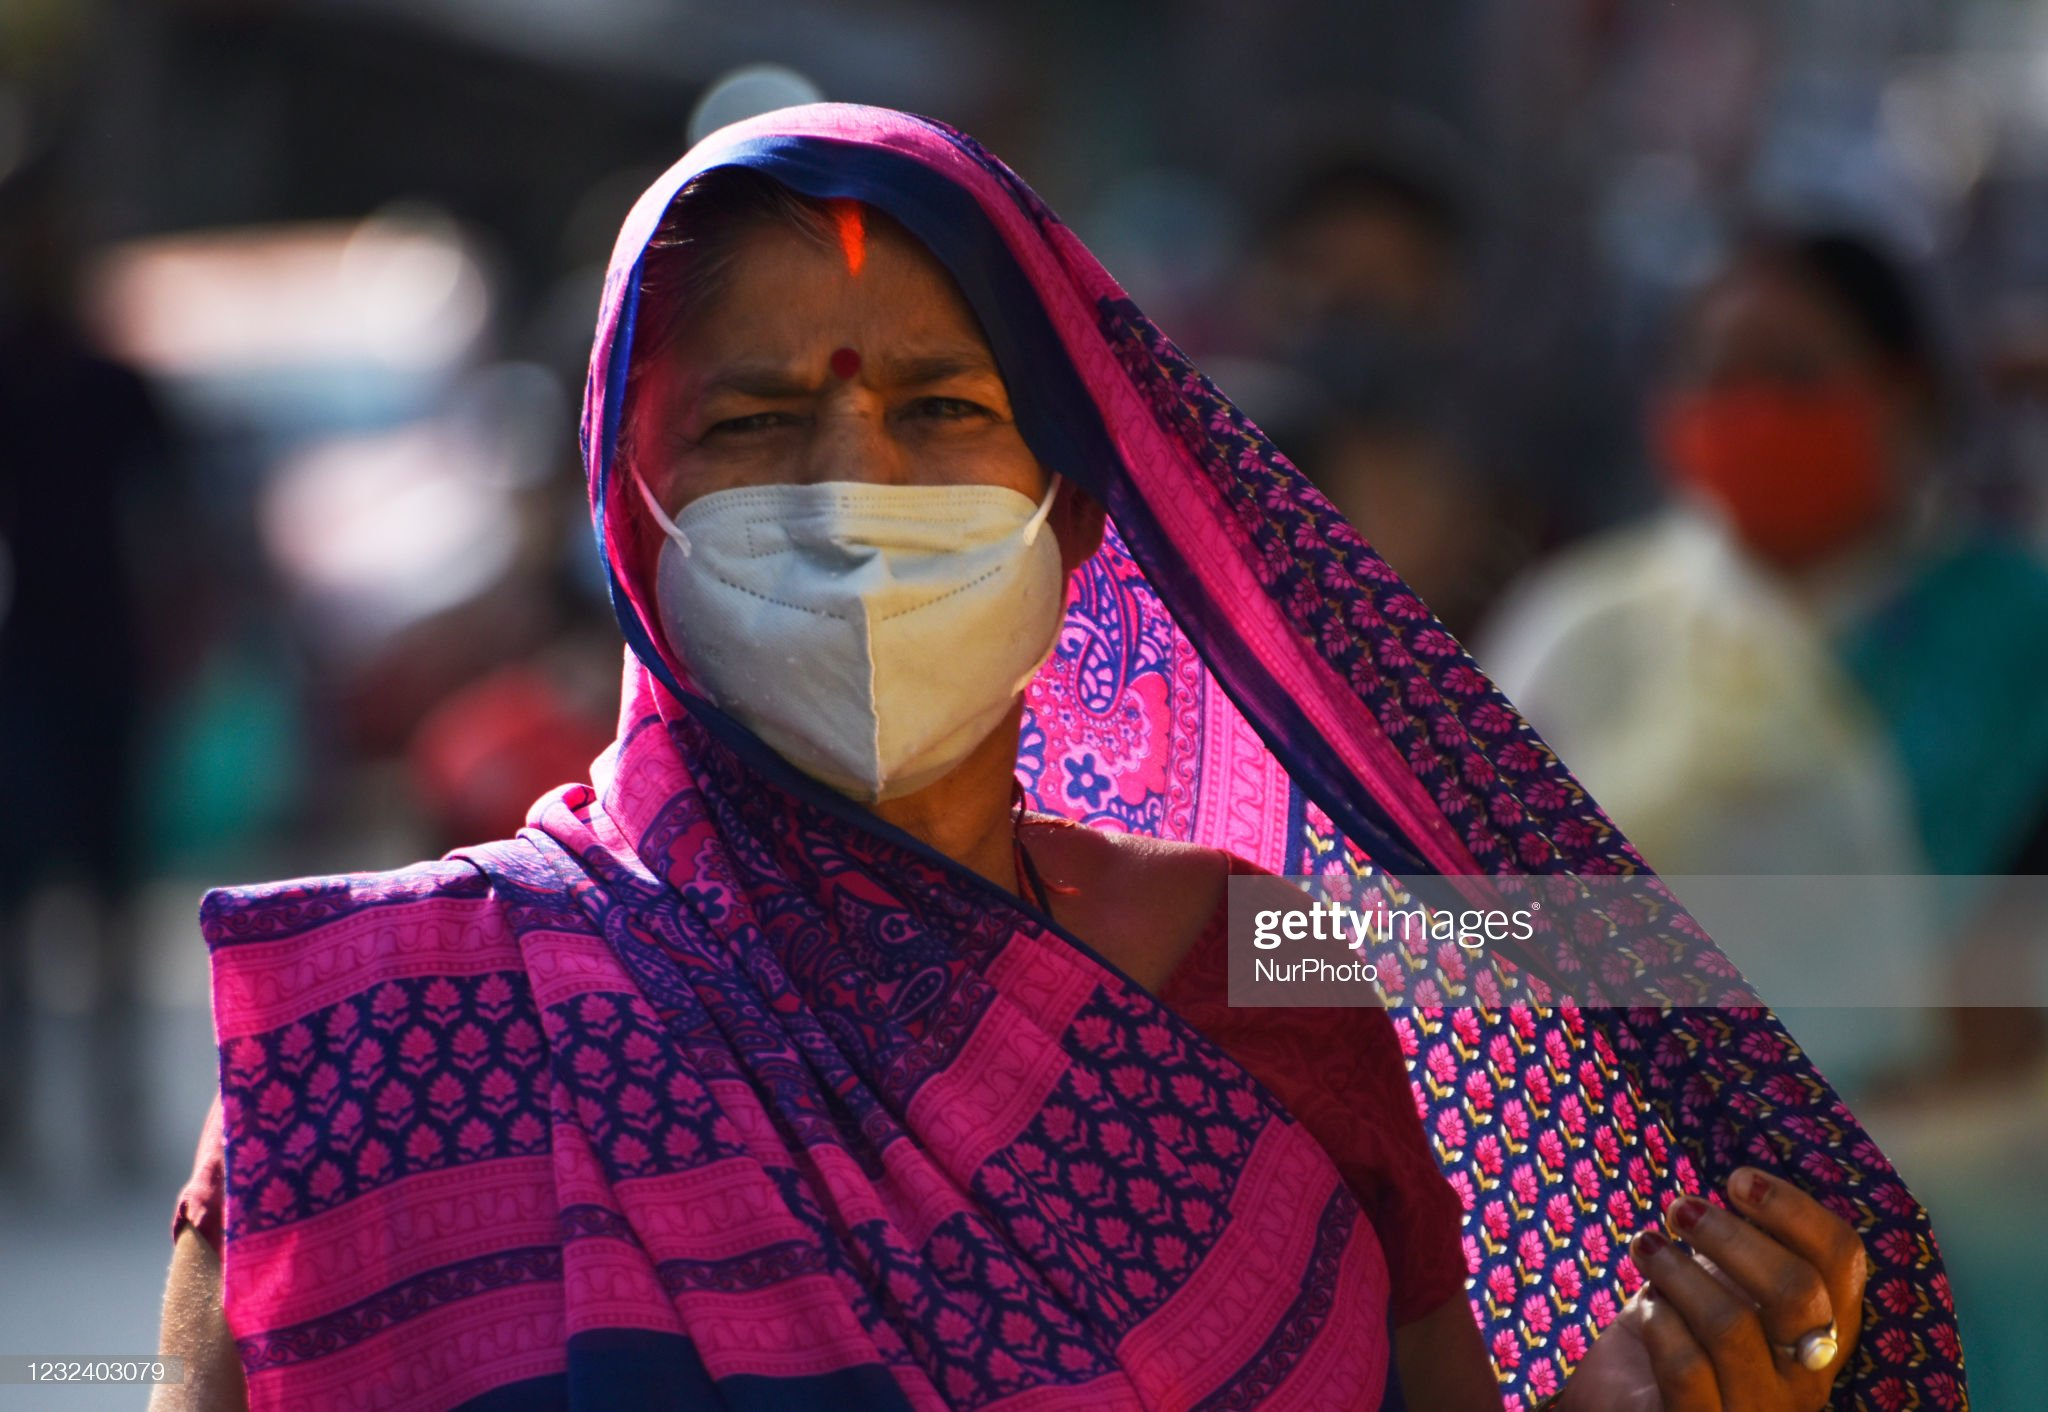 India COVID: Indian woman wearing sari and COVID mask